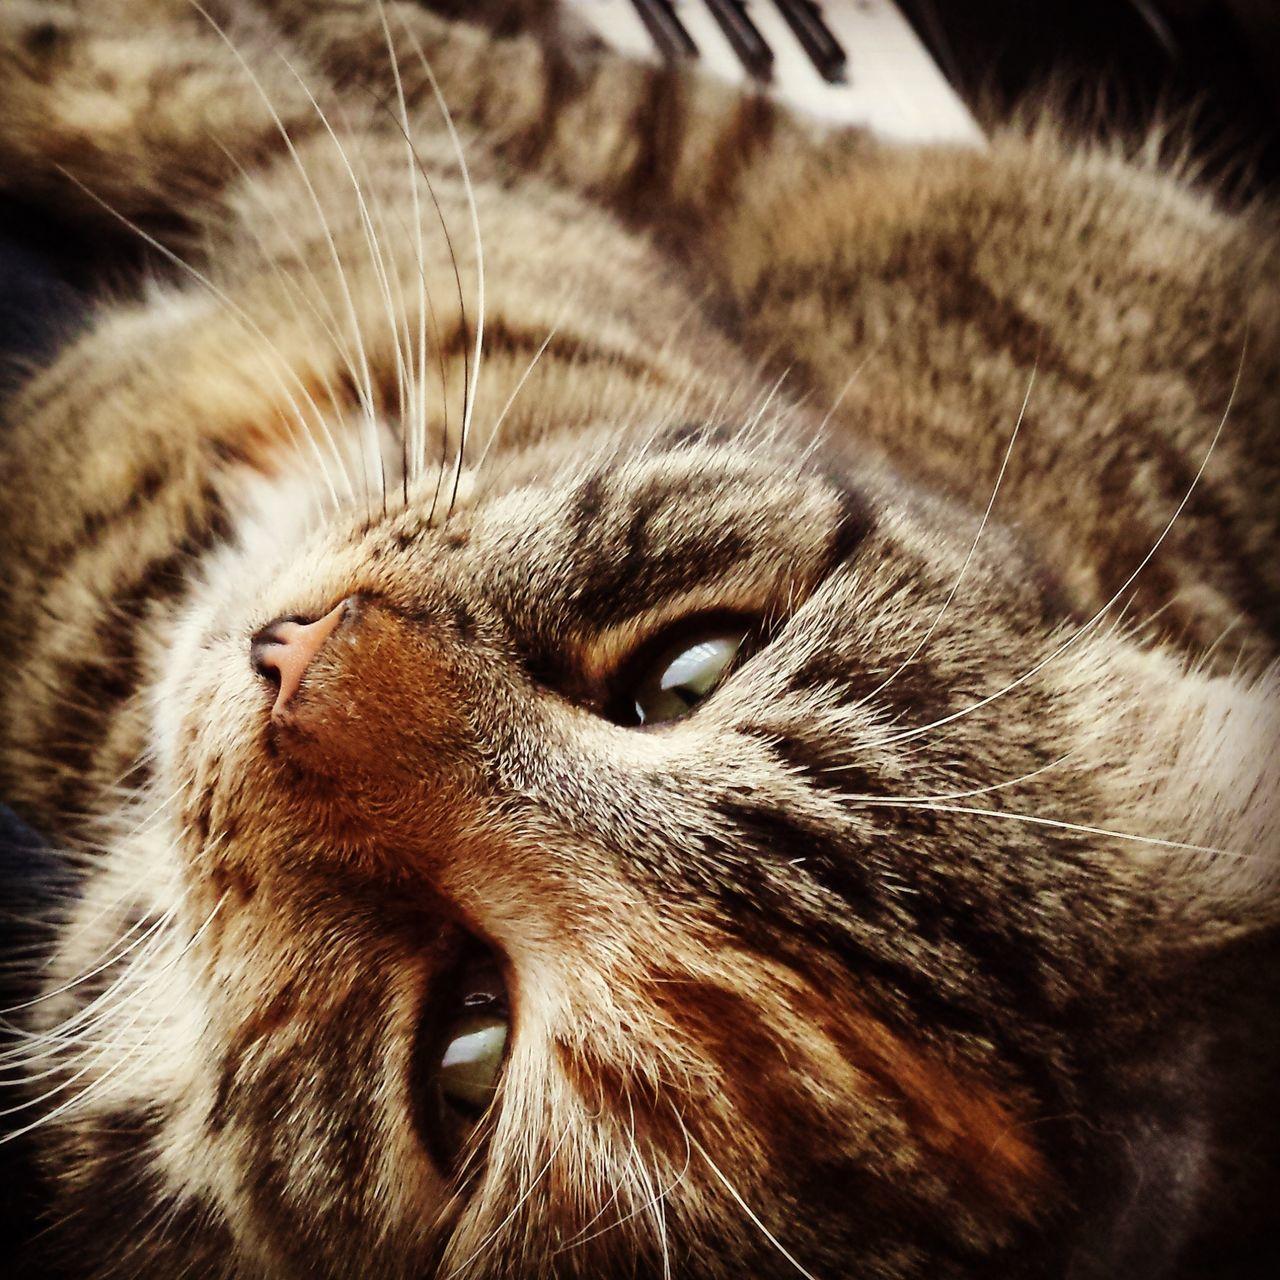 One Animal Animal Themes Close-up Domestic Cat Pets Outdoors No People Domestic Animals Feline Day Cat Catlovers Catlady Grumpy Cat Animallovers Animal Cats Catsoftheworld Catsagram Catoftheday